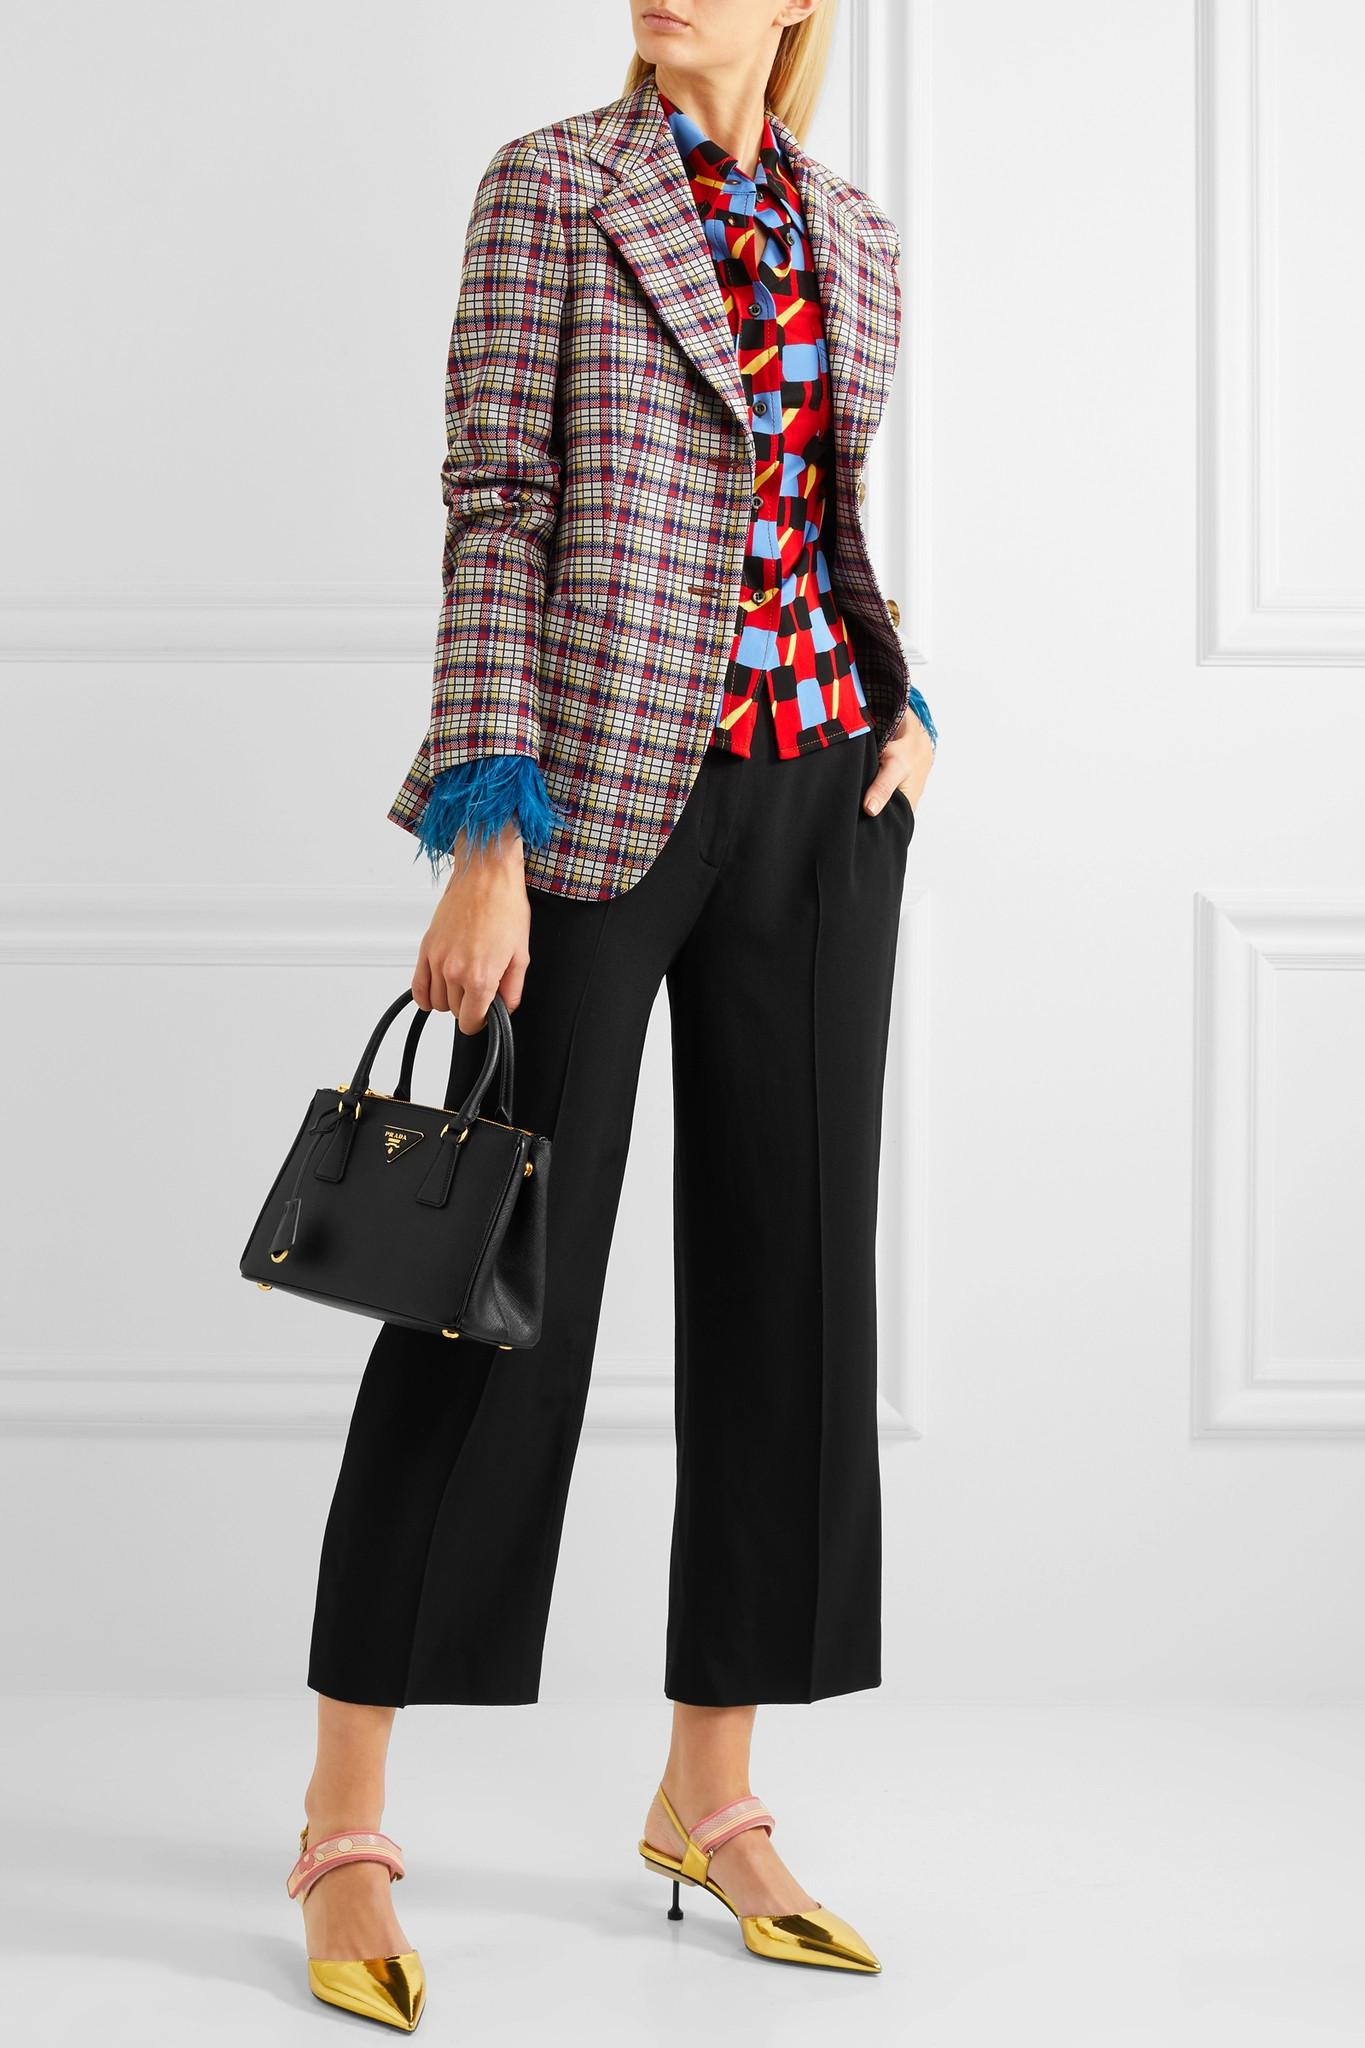 33e576140bae Lyst - Prada Galleria Mini Textured-leather Tote in Black